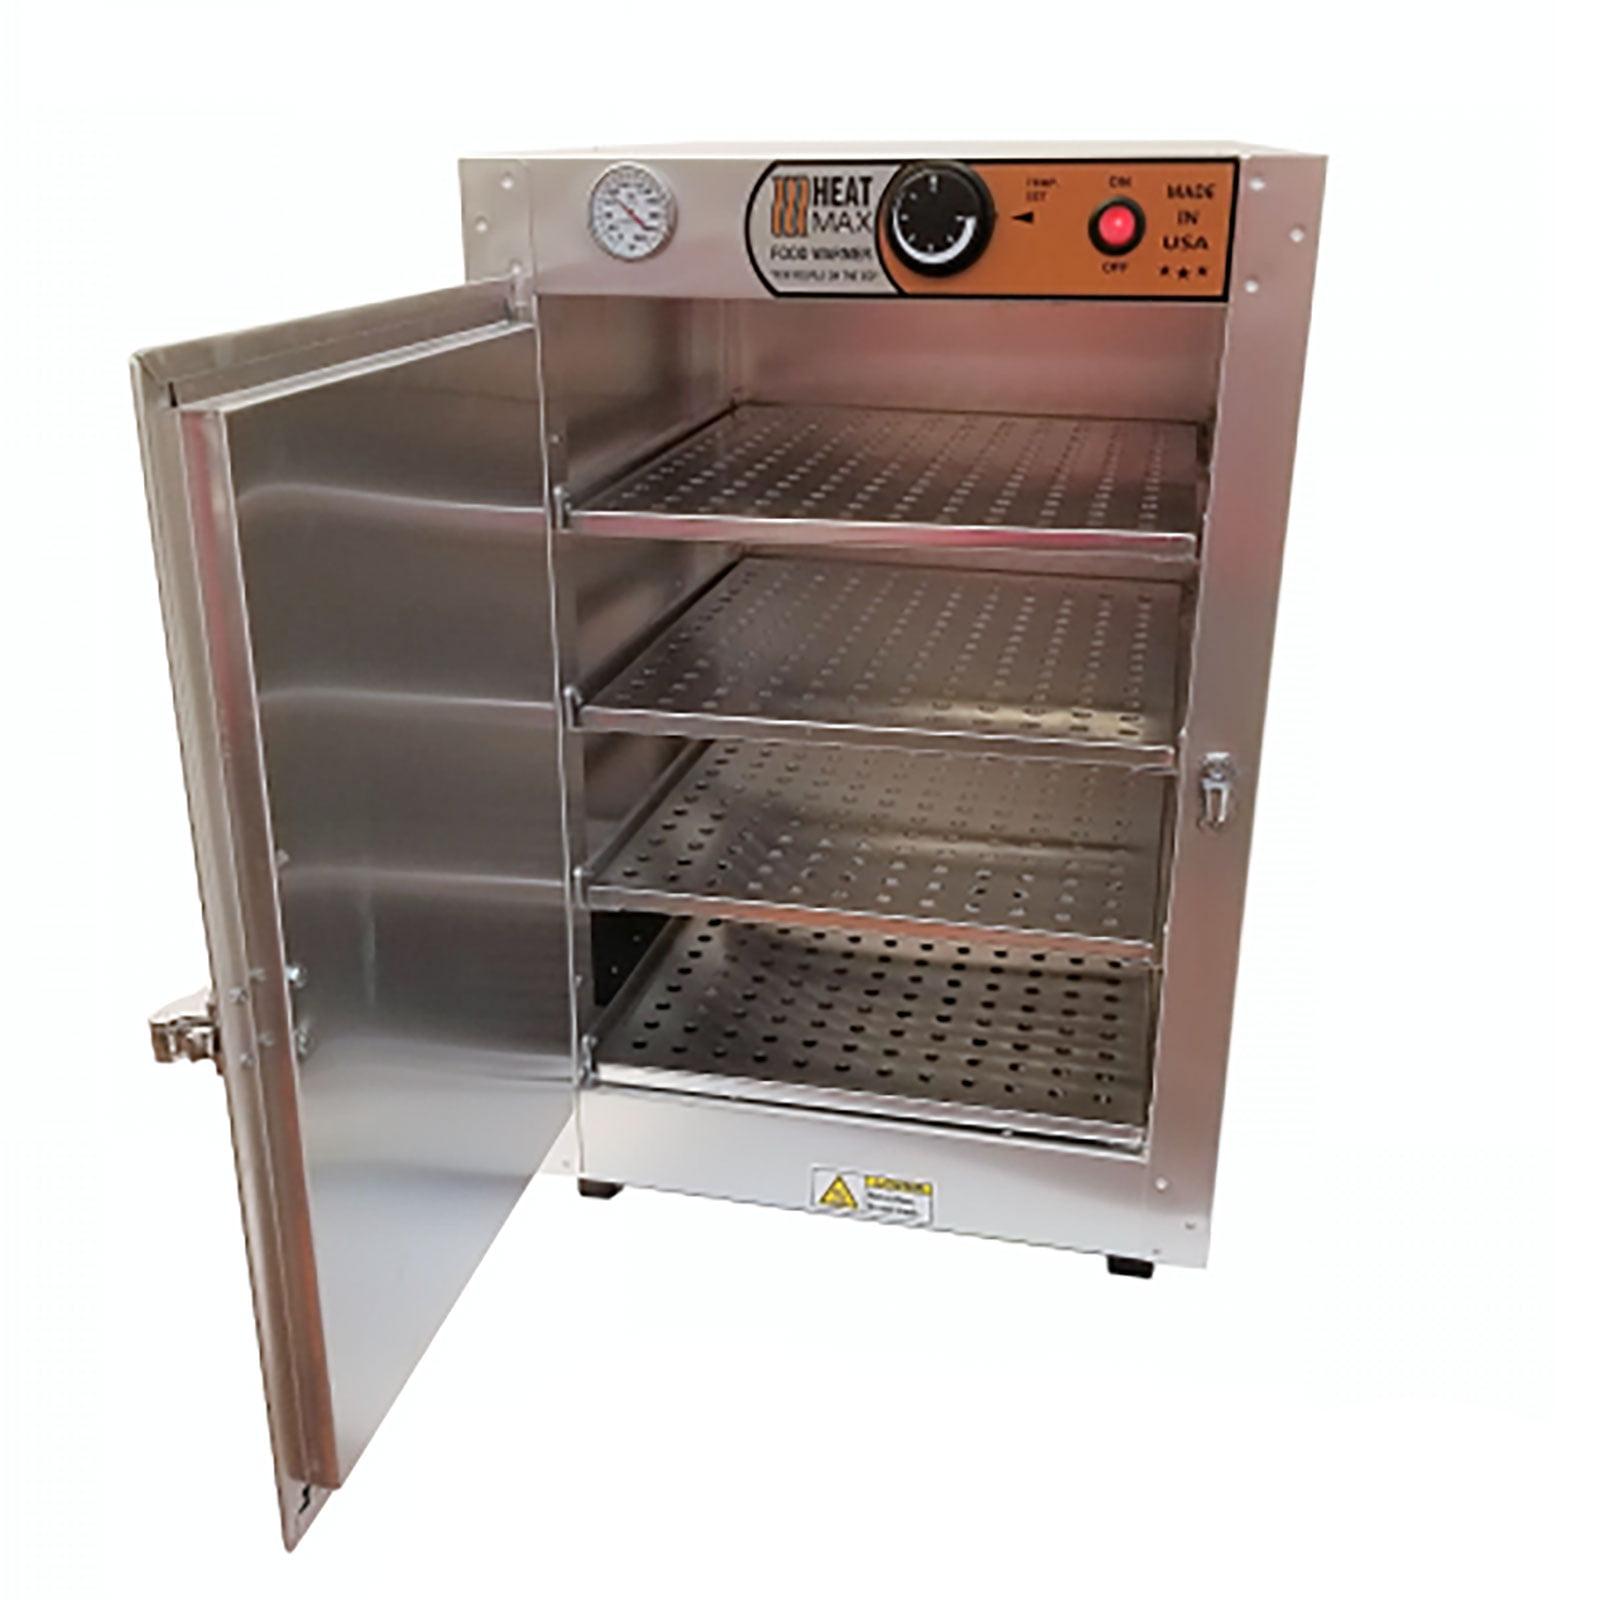 HeatMax Commercial Food Pastry Warming Case Aluminum 16x16x24 Hot Box Cabinet